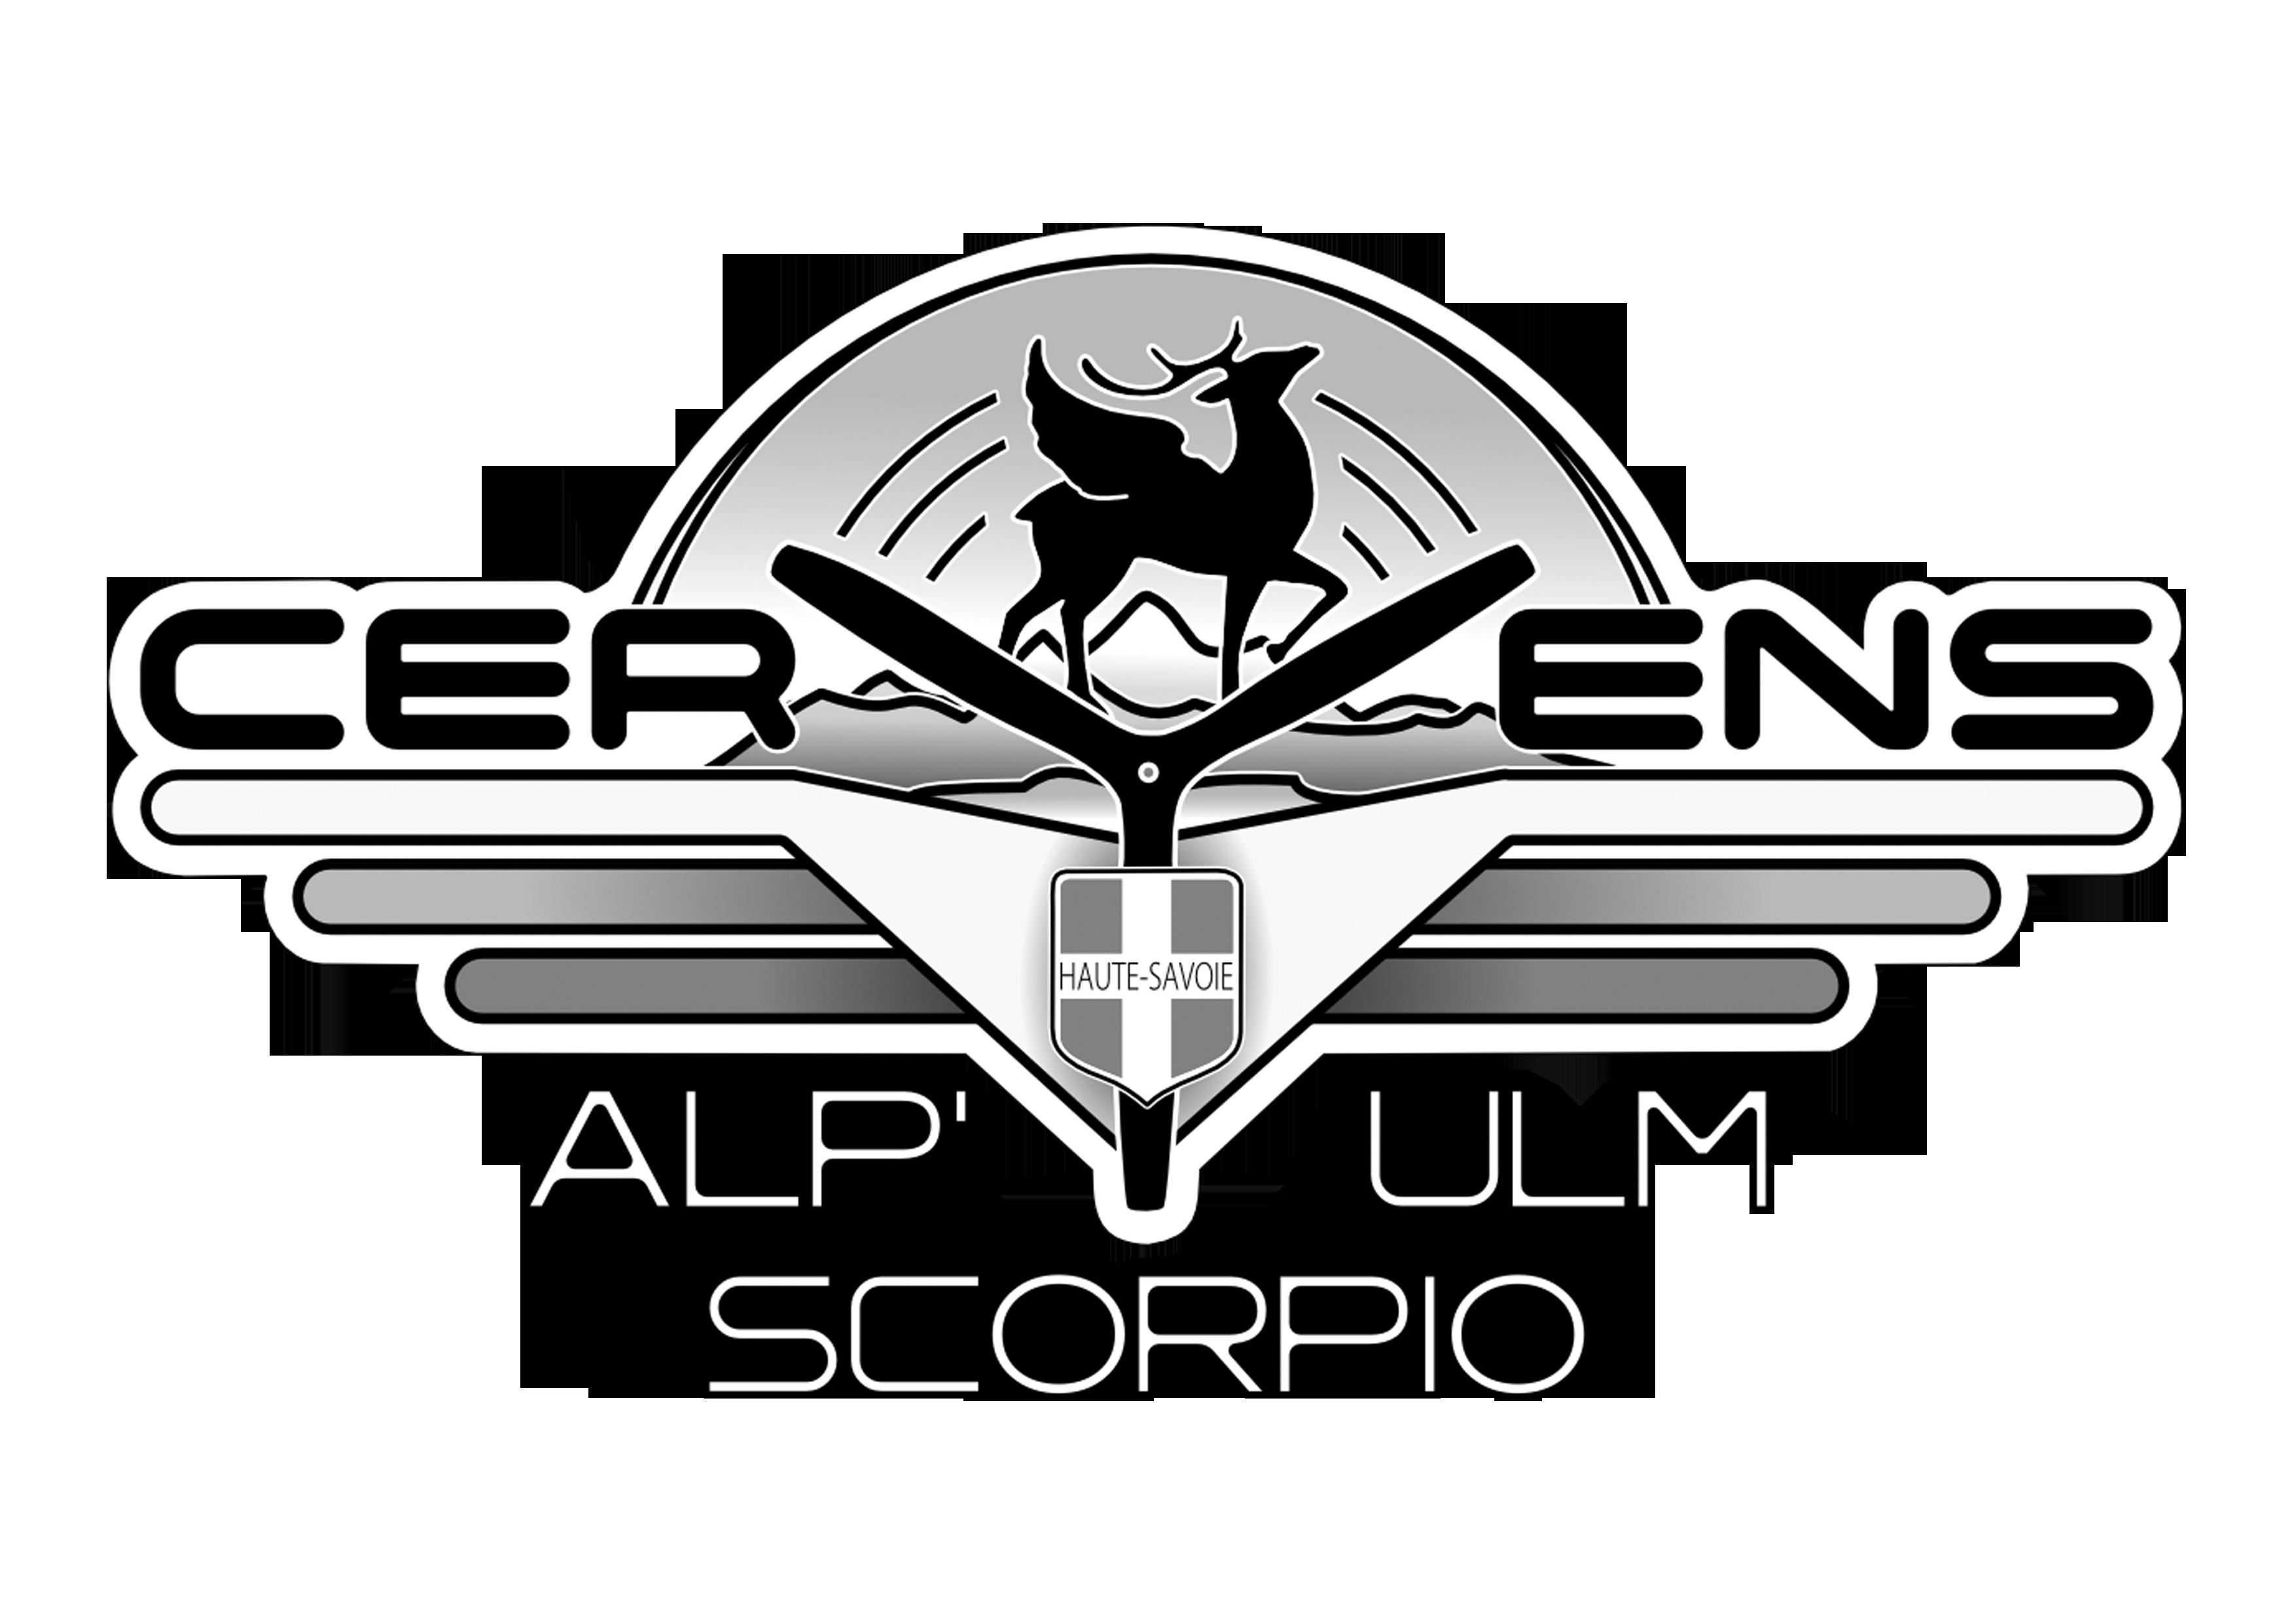 alp'ulm